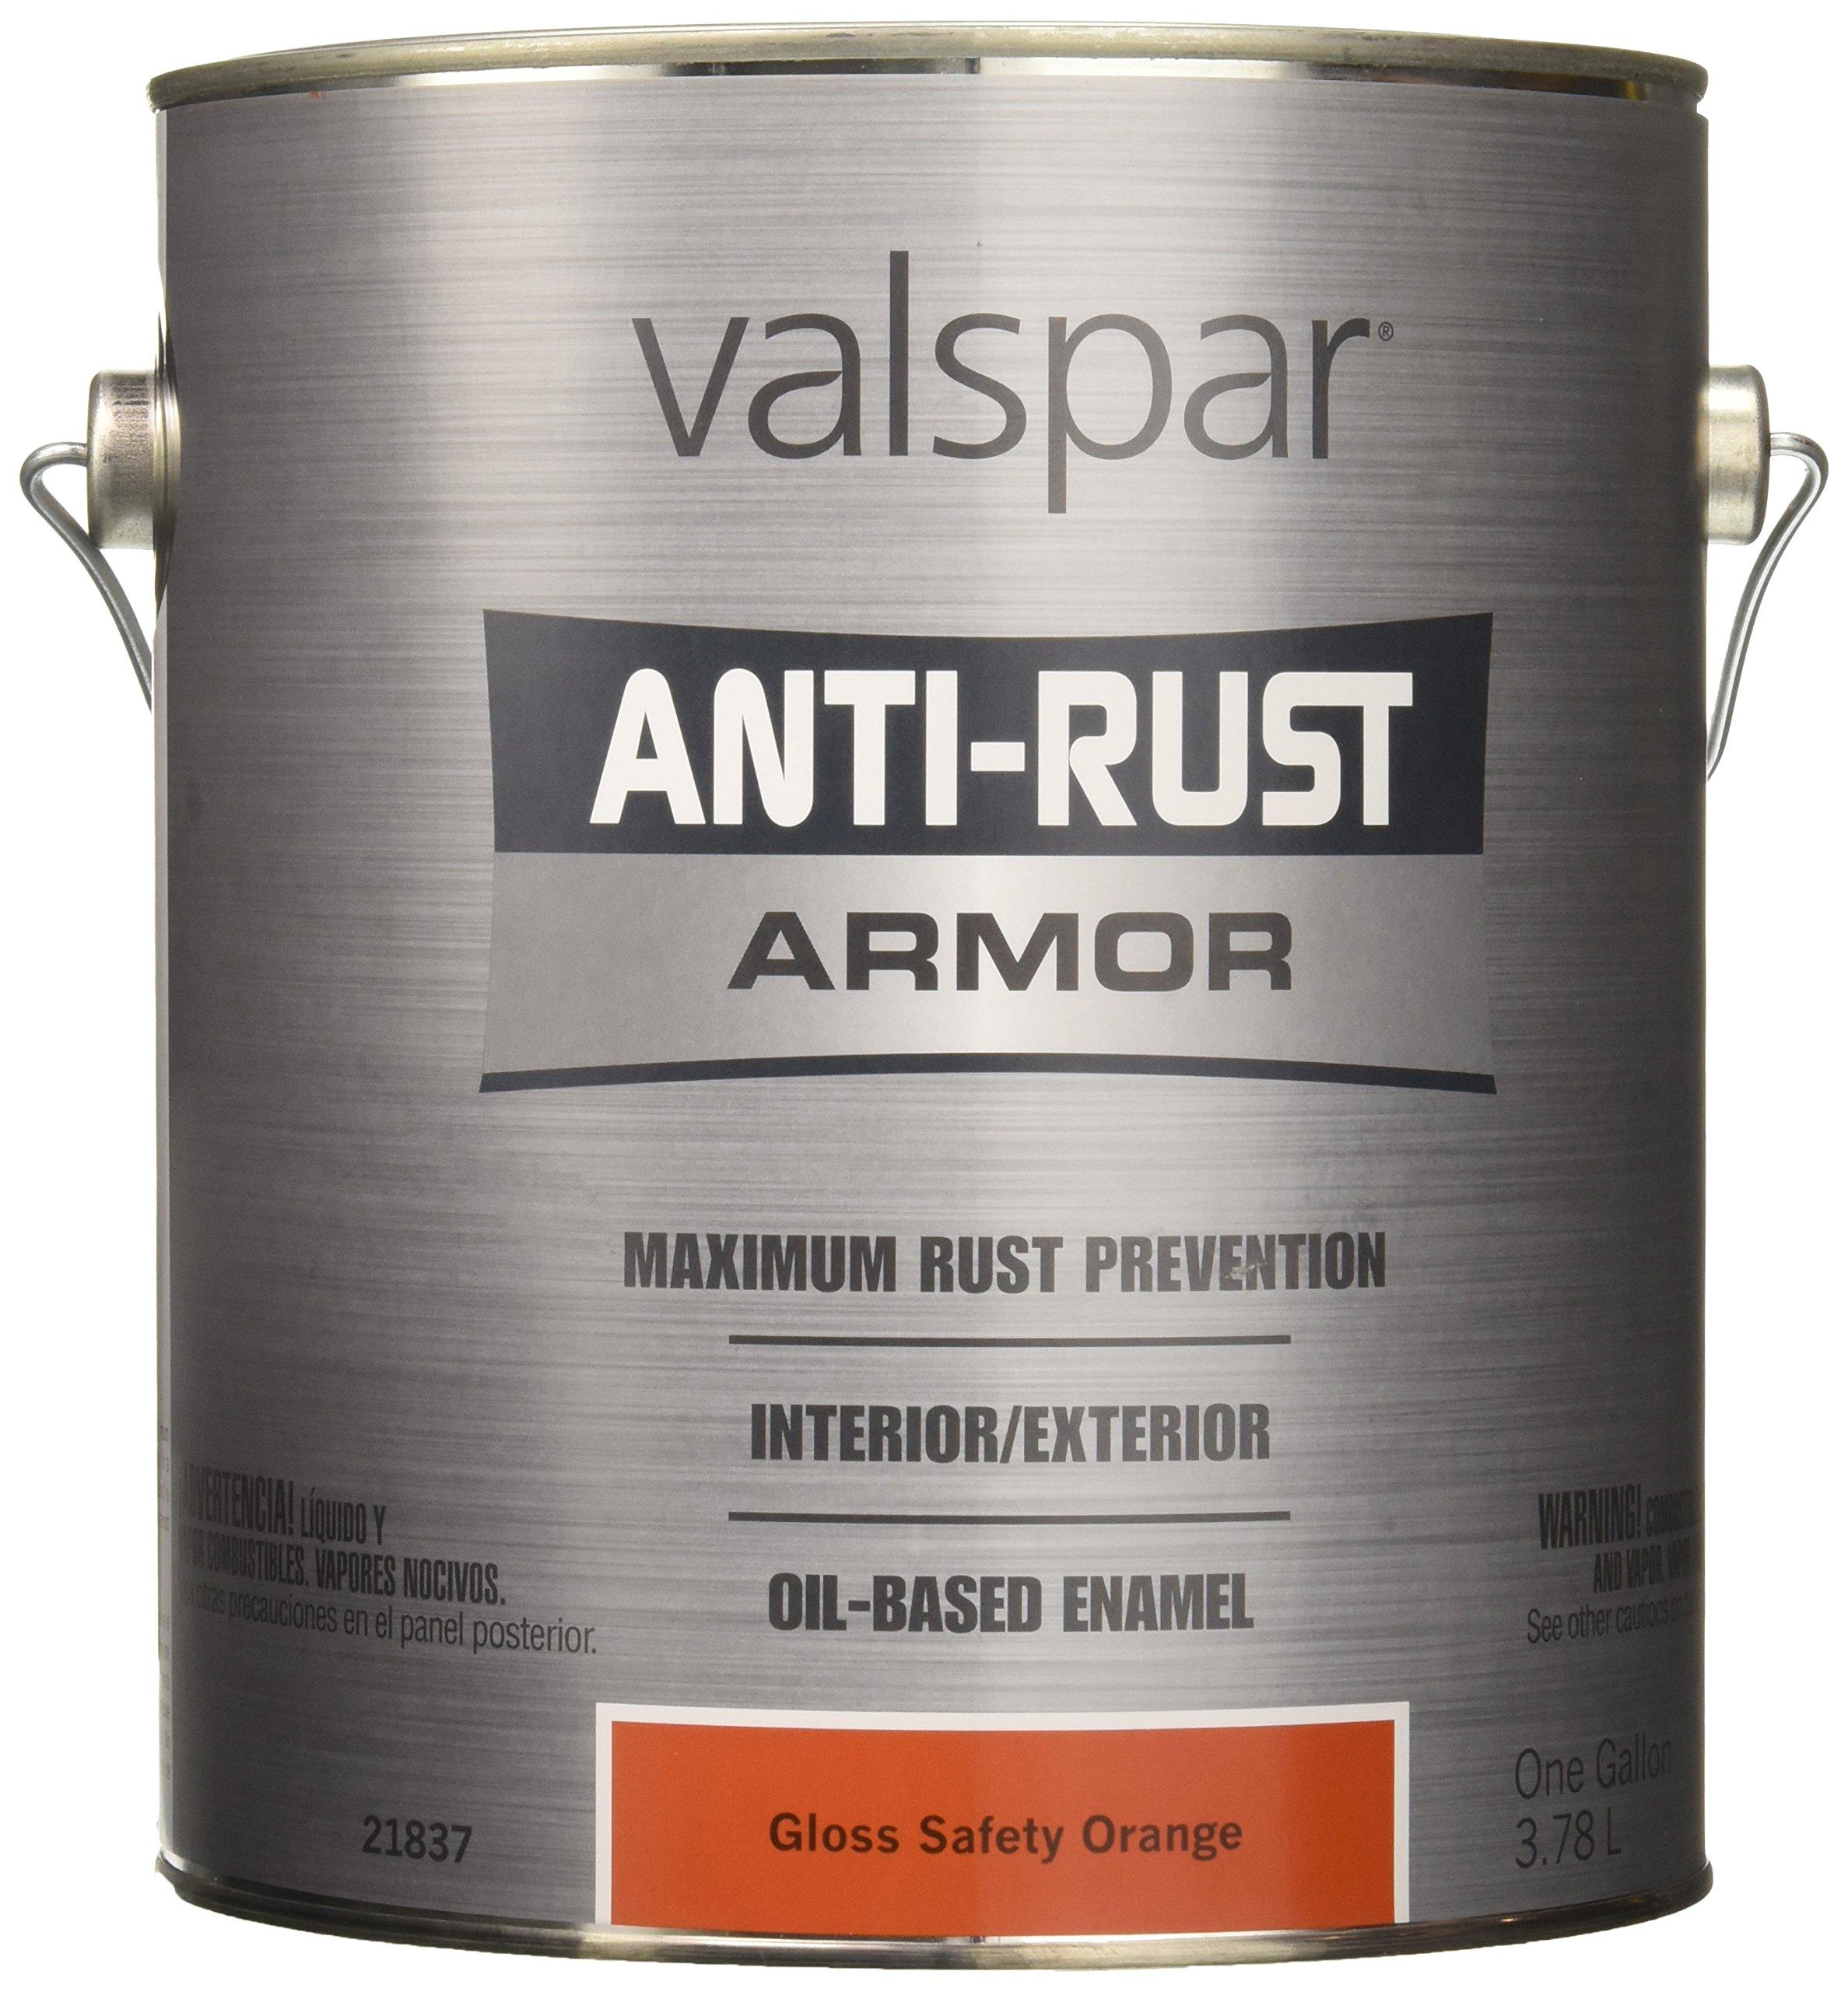 Valspar 21837G Safety Orange Enamel - 1 Gallon